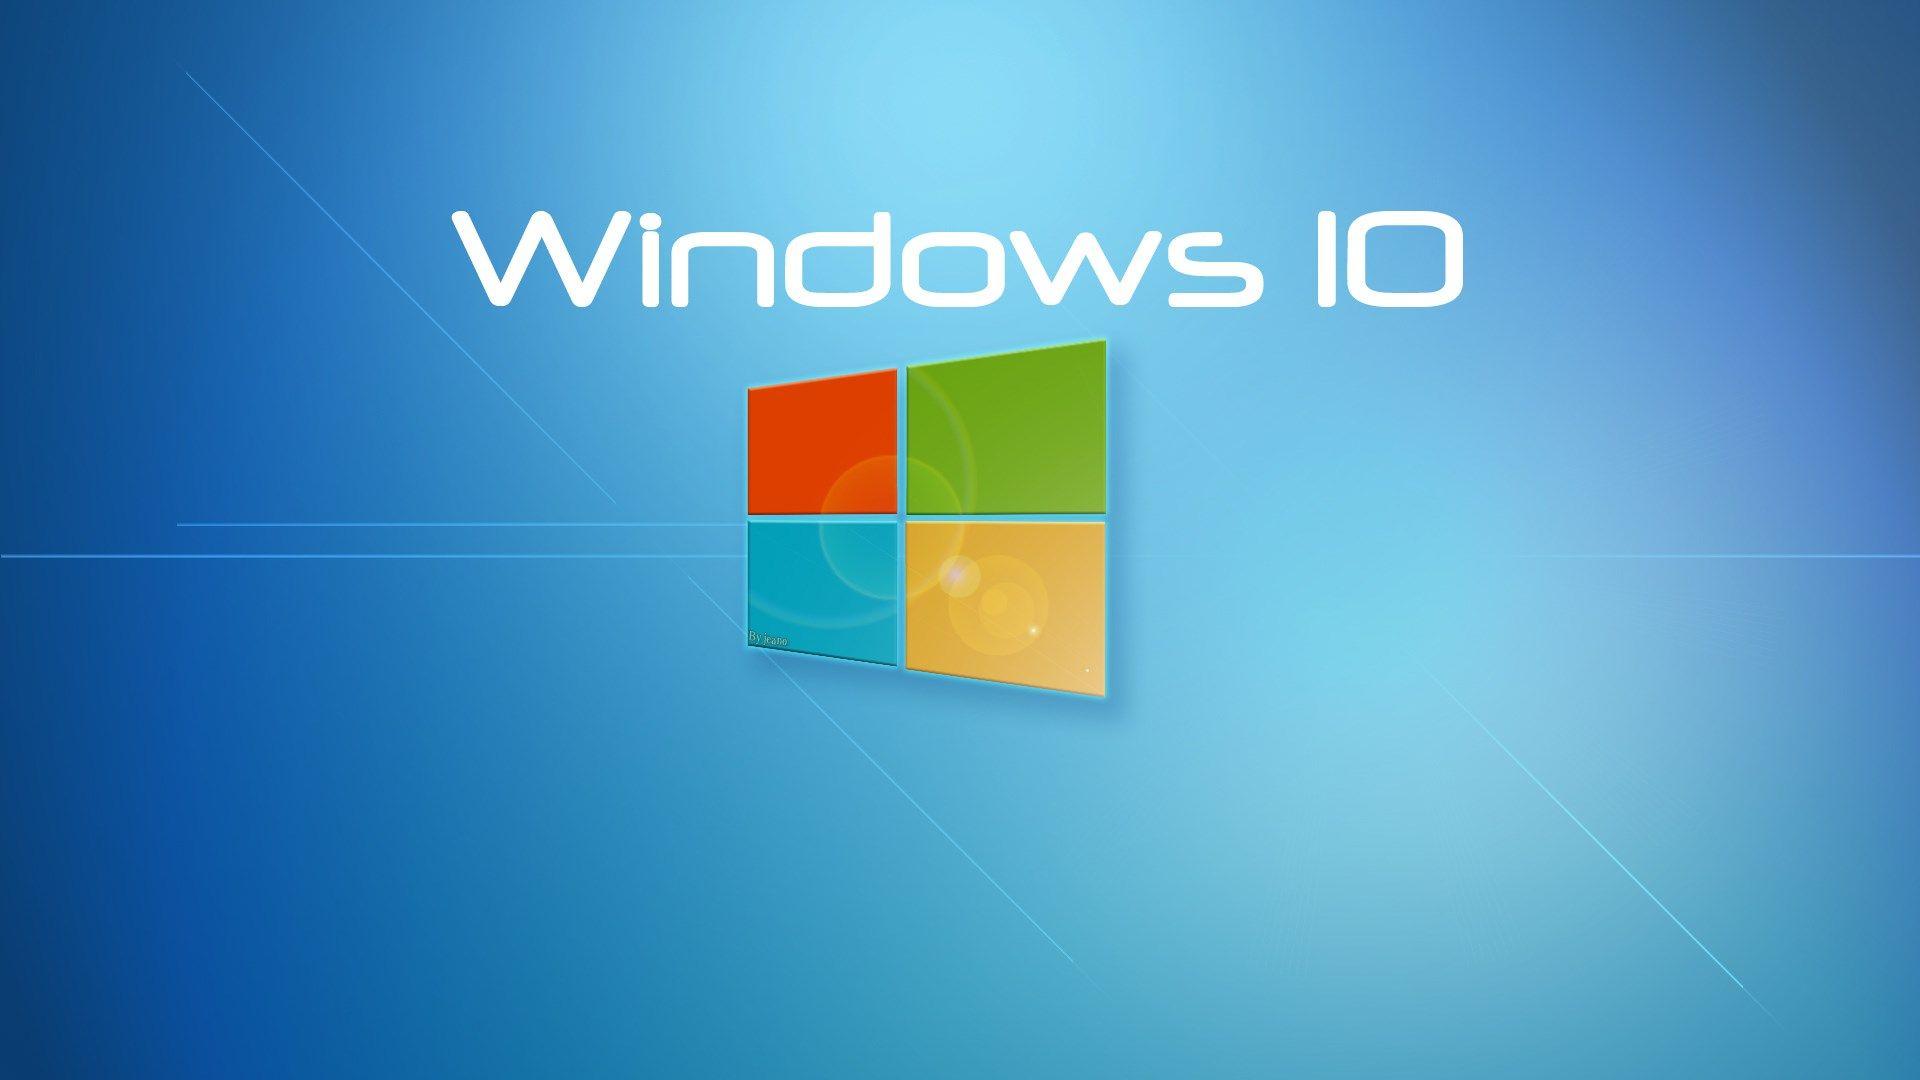 Hd Windows 10 Wallpaper Windows 10 Logo Windows 10 Windows 10 Features